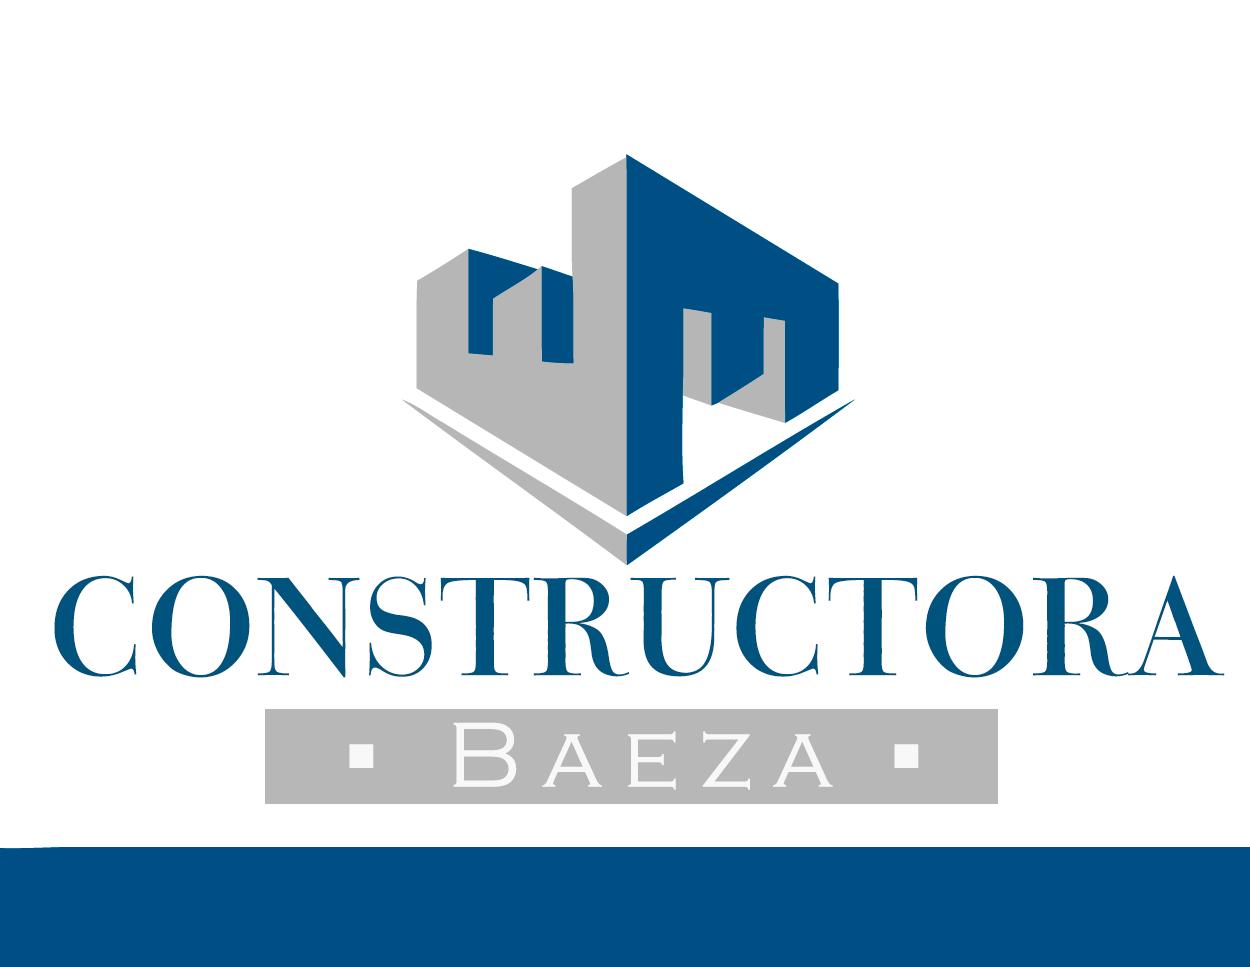 Constructora Baeza